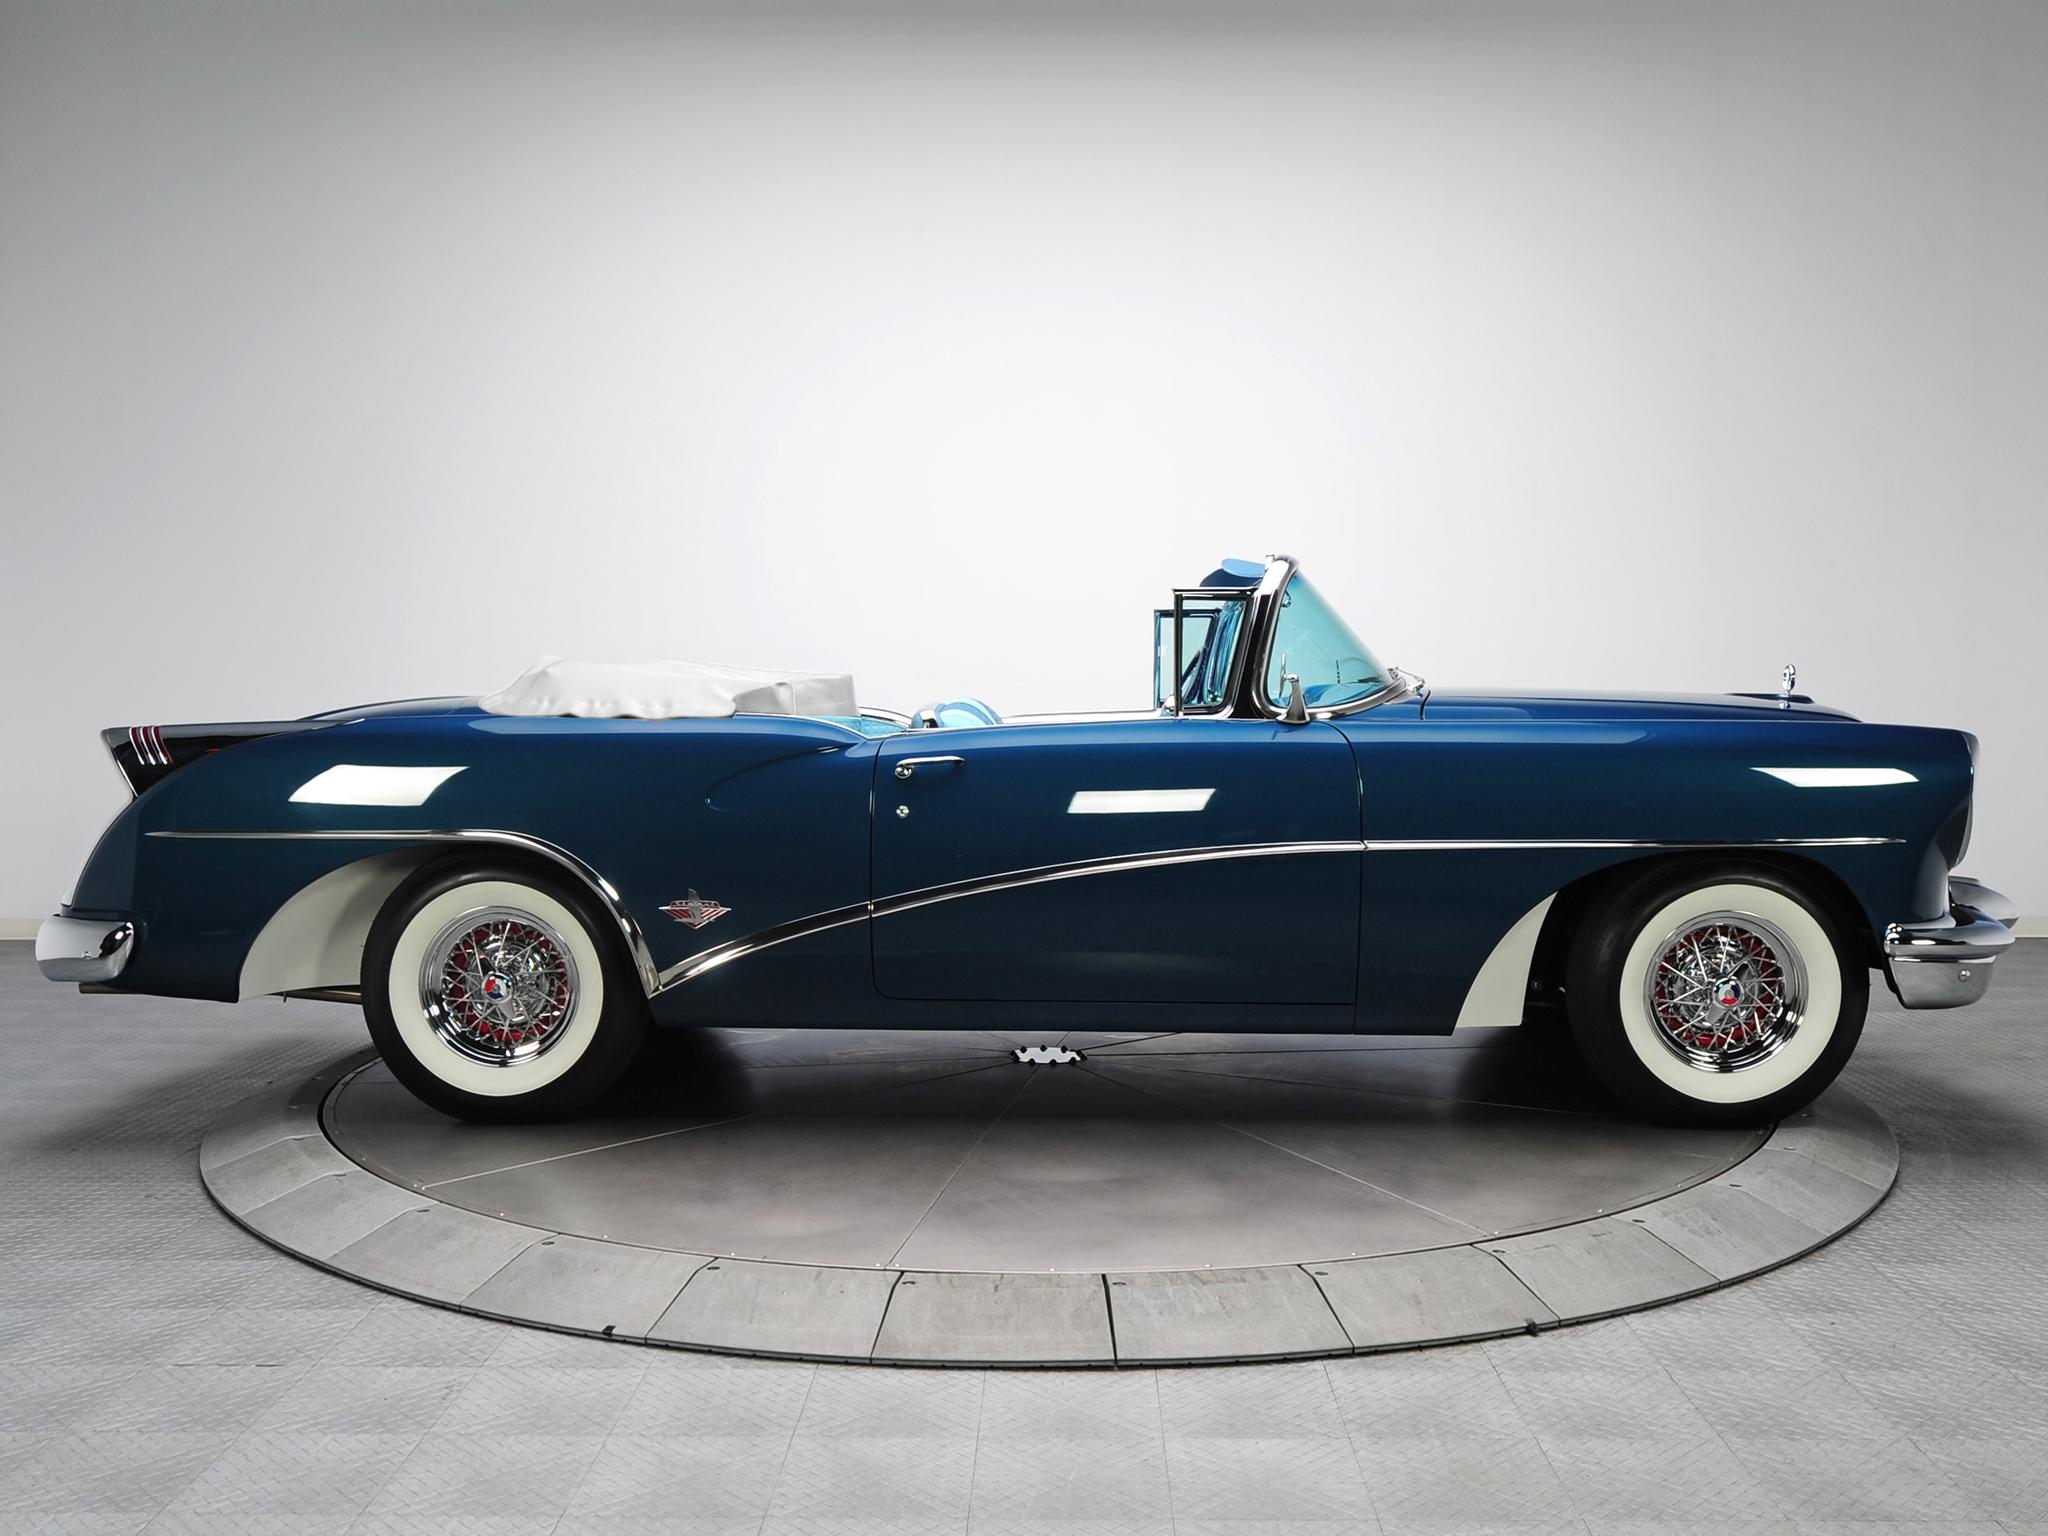 1954 Buick Skylark 4667sx Convertible Retro E Wallpaper 1951 For Sale 2048x1536 157117 Wallpaperup